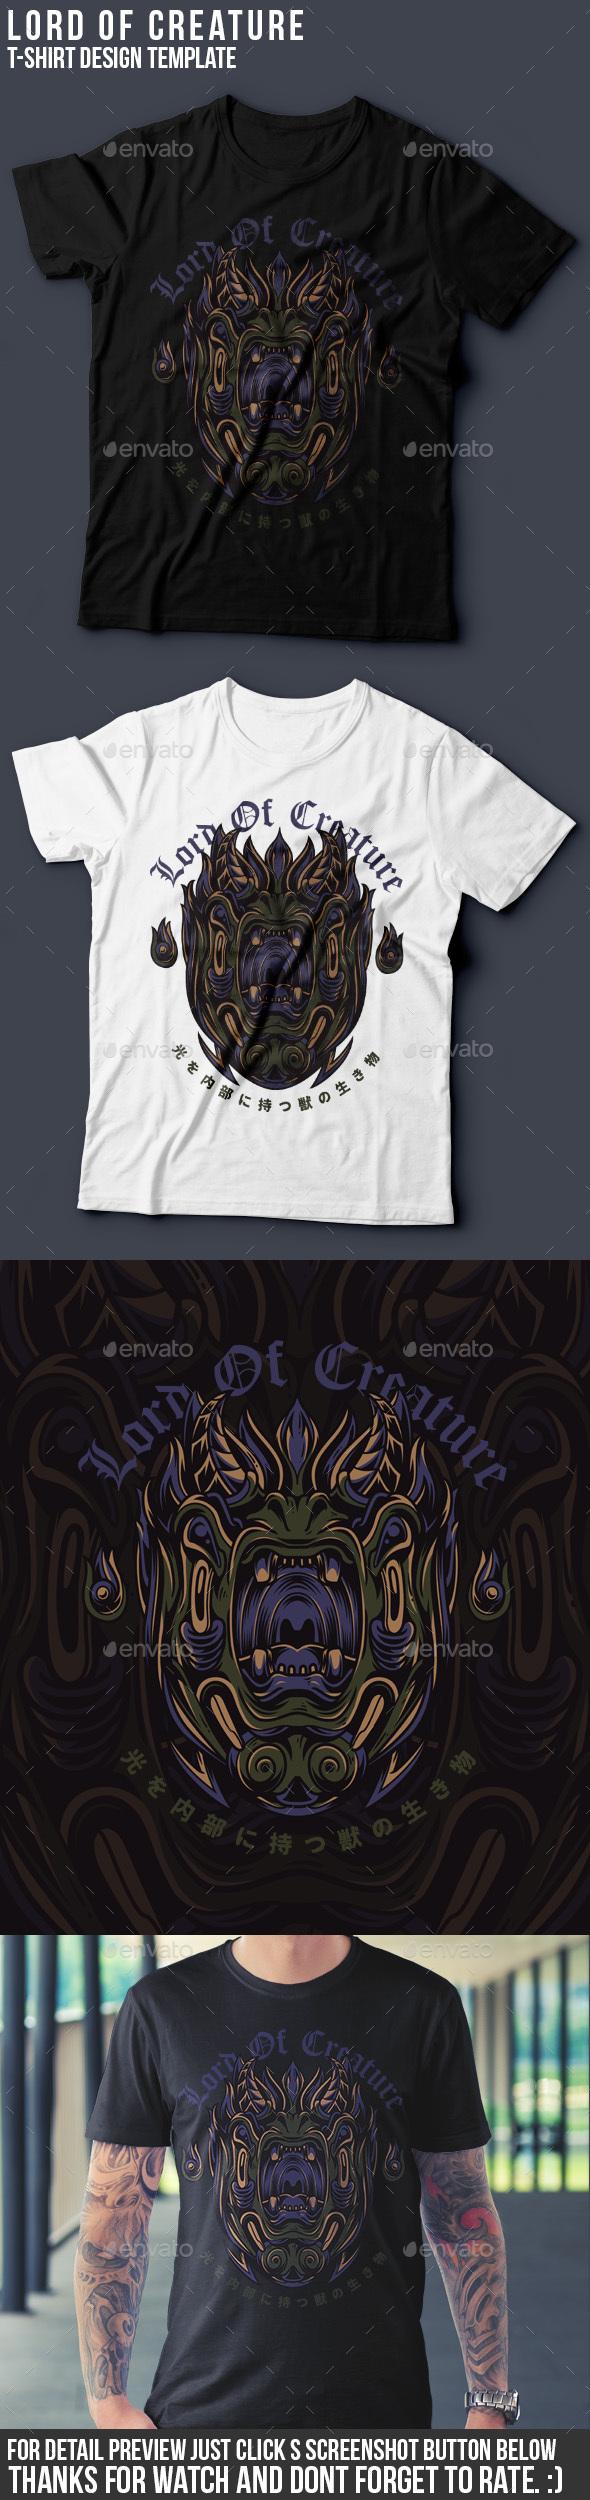 Lord of Creature T-Shirt Design - Grunge Designs